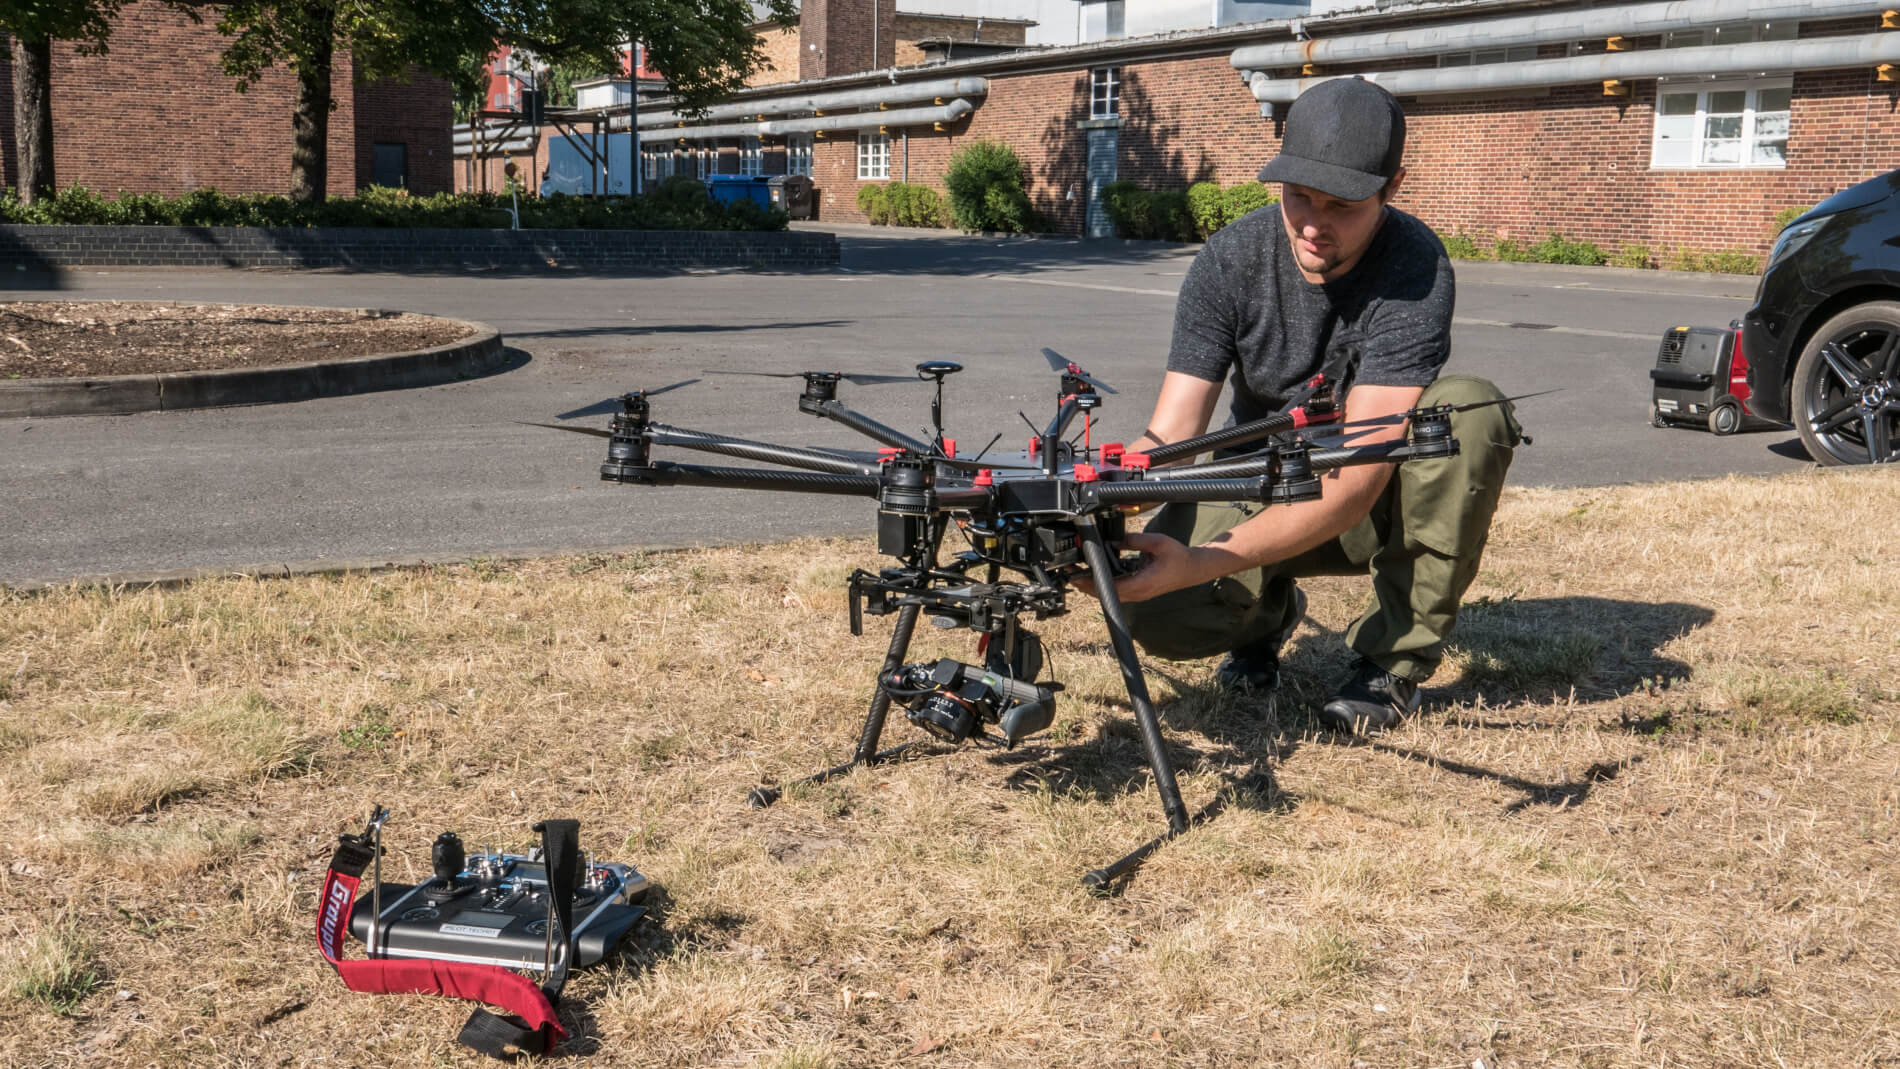 Pilot-Logxon-ready-for-takeoff-drohne-uav-vorbereitung-drone-abflugbereit-propeller-fernsteuerung-graupner-3D-Datenerfassung